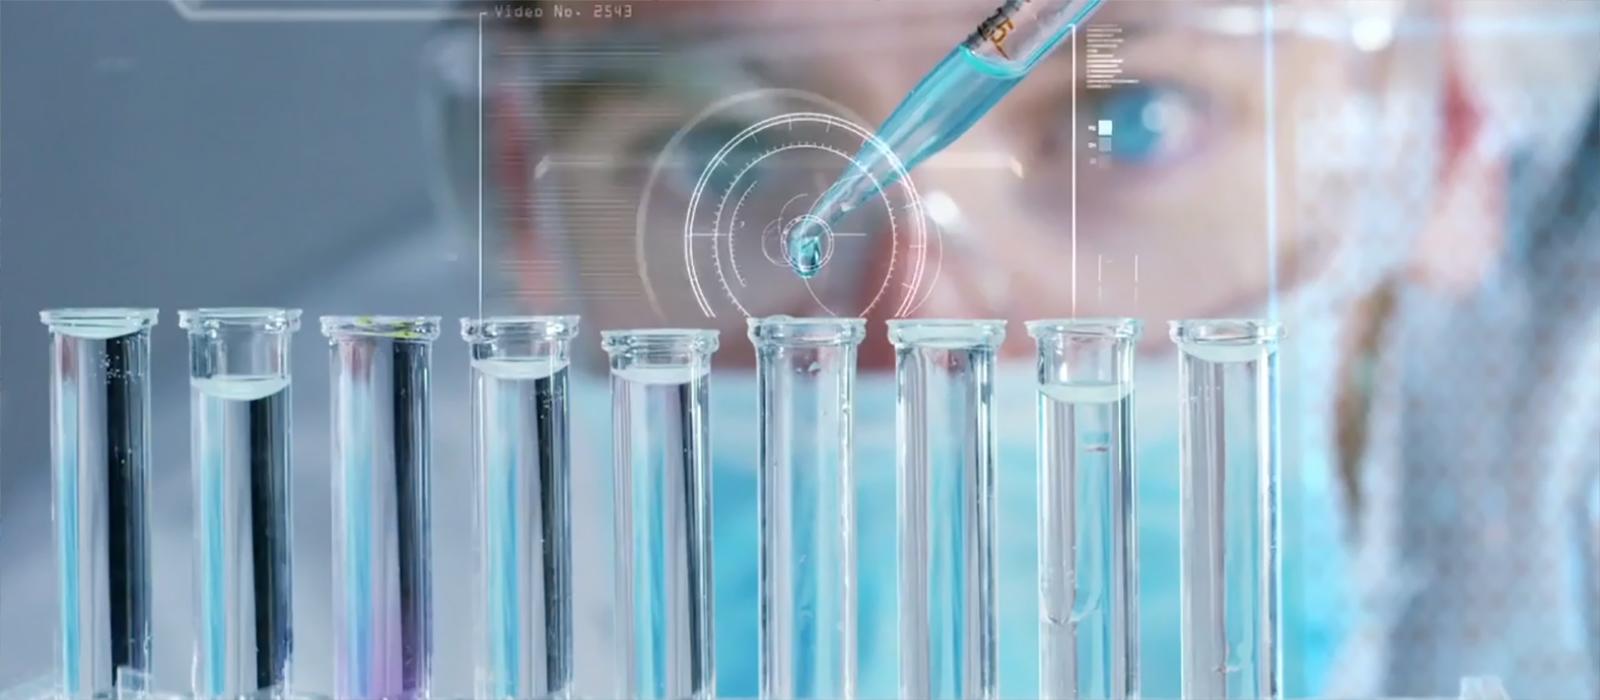 Phenomenex associate testing a liquid in test tube